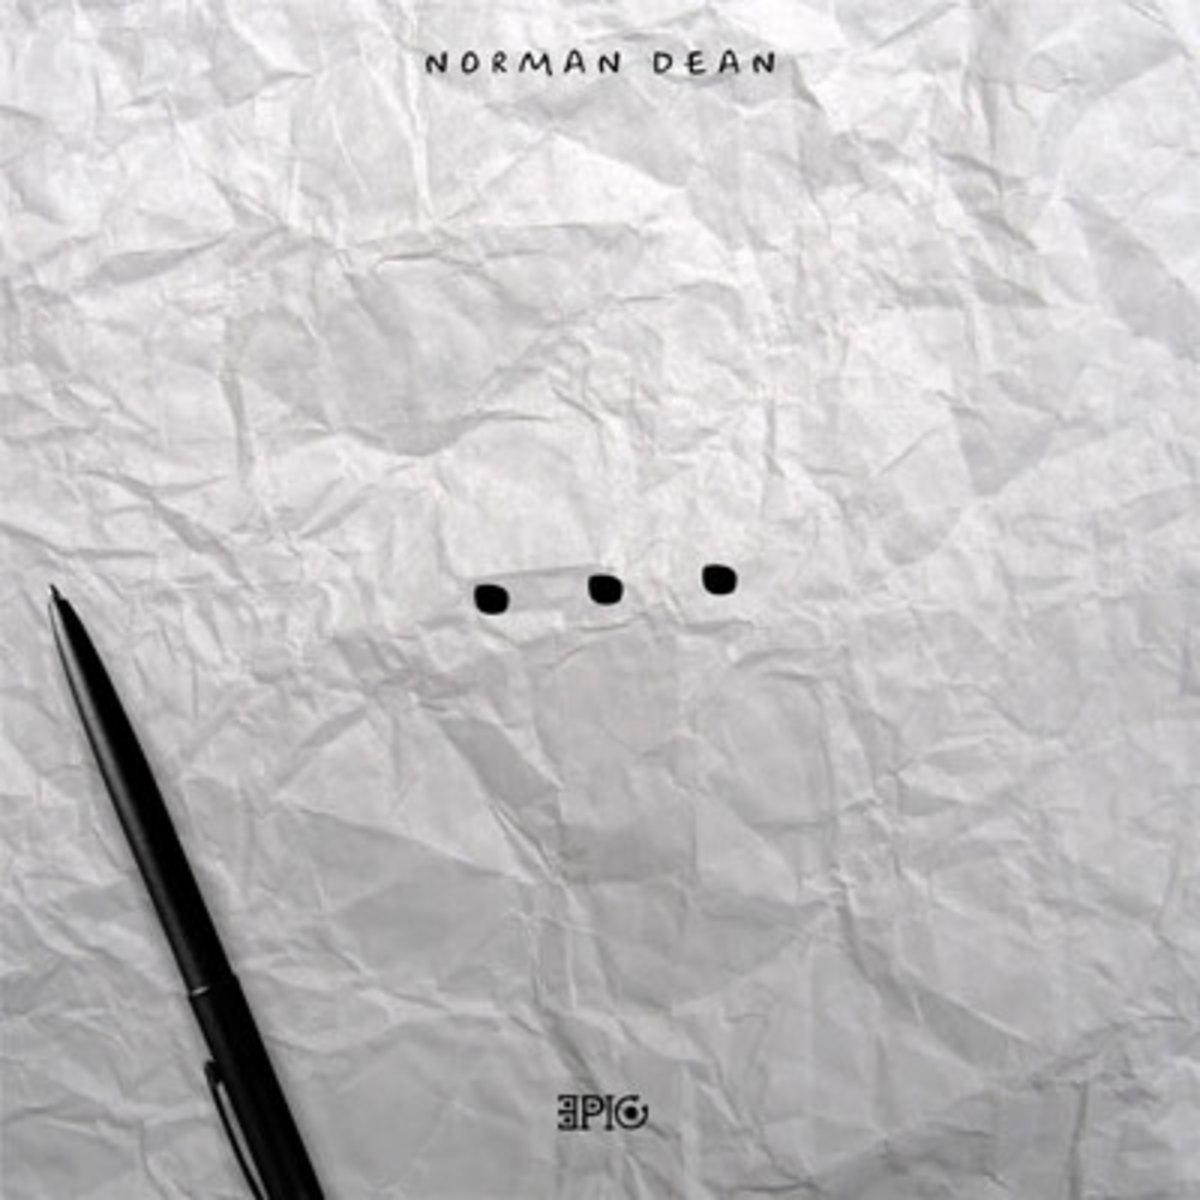 norman-dean-run-on-sentence.jpg